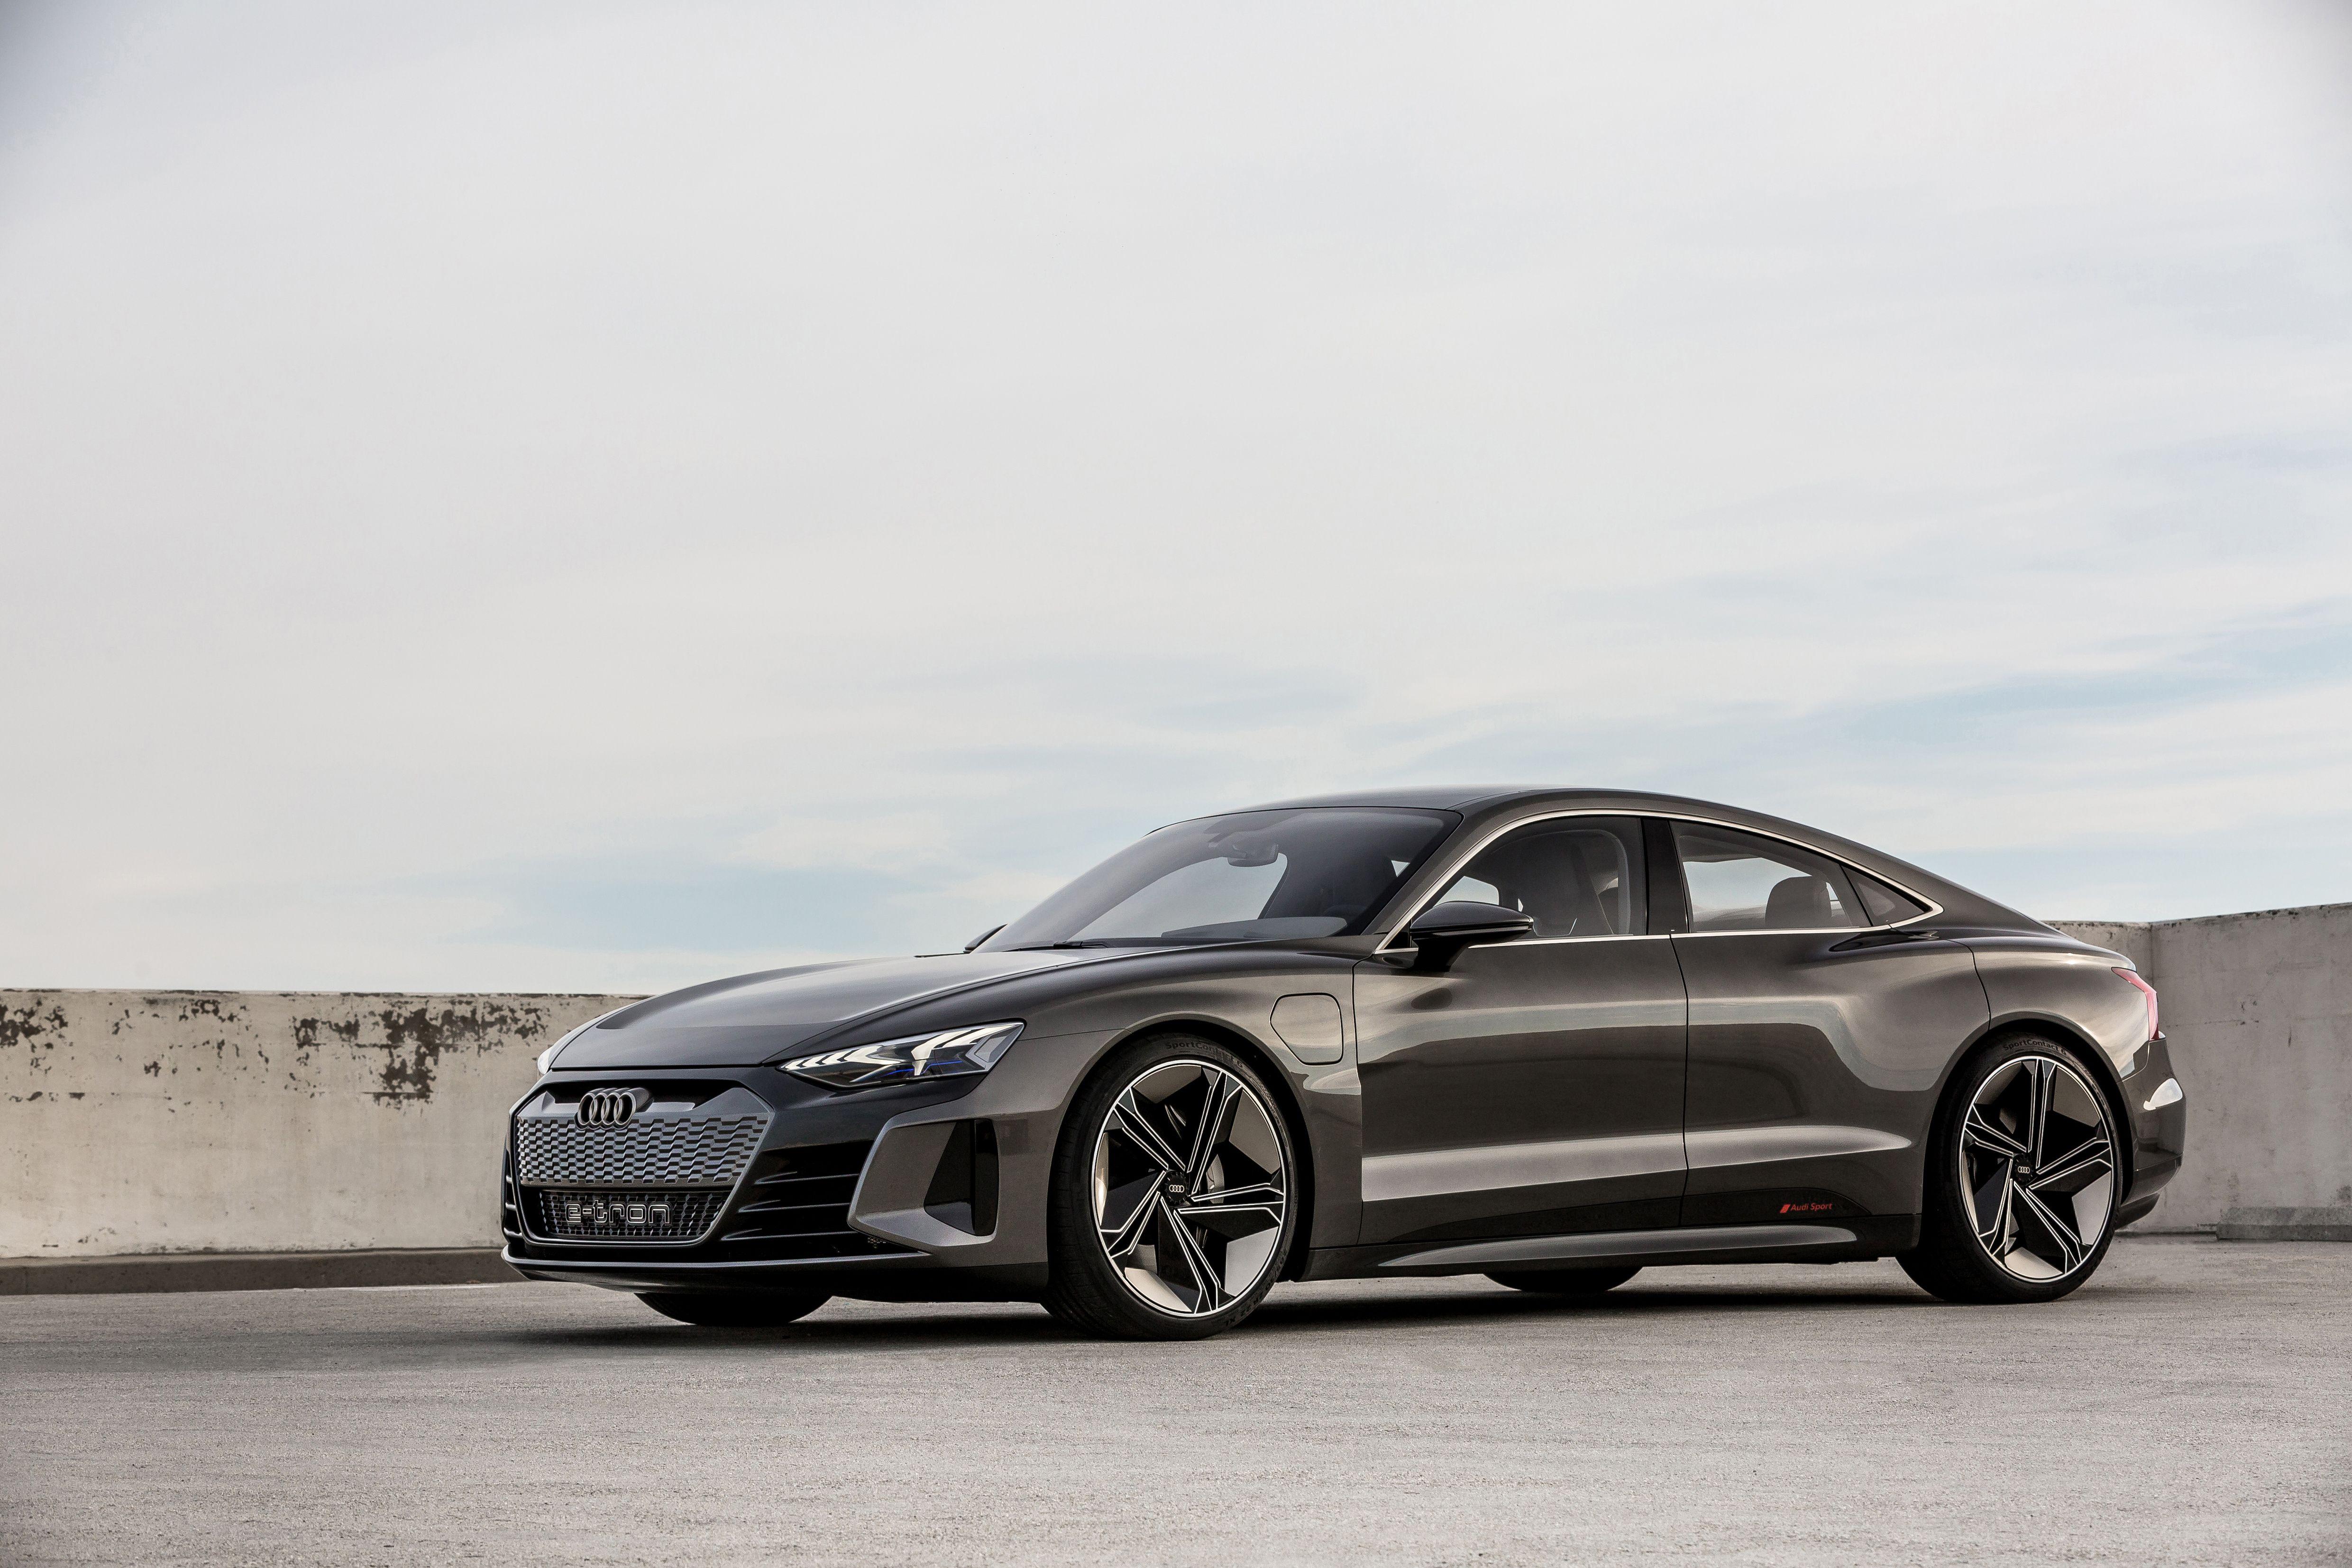 4k Wallpaper 2018 Audi E Tron Gt Concept Audi Cars